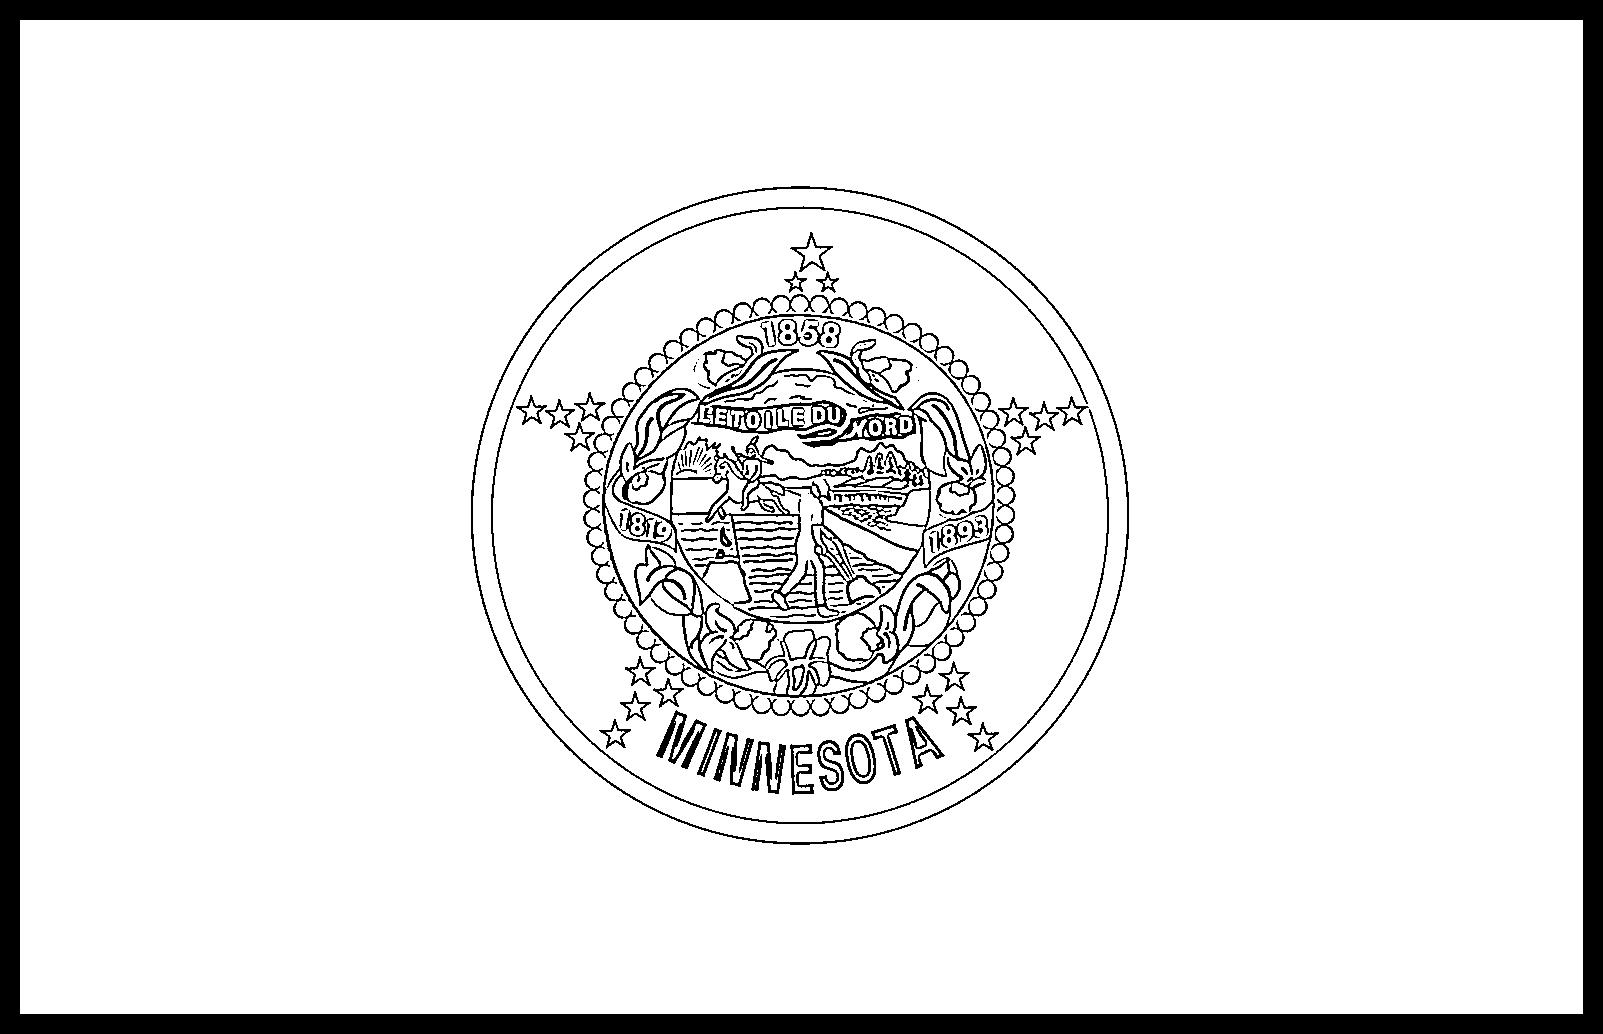 Minnesota Flag Coloring Page